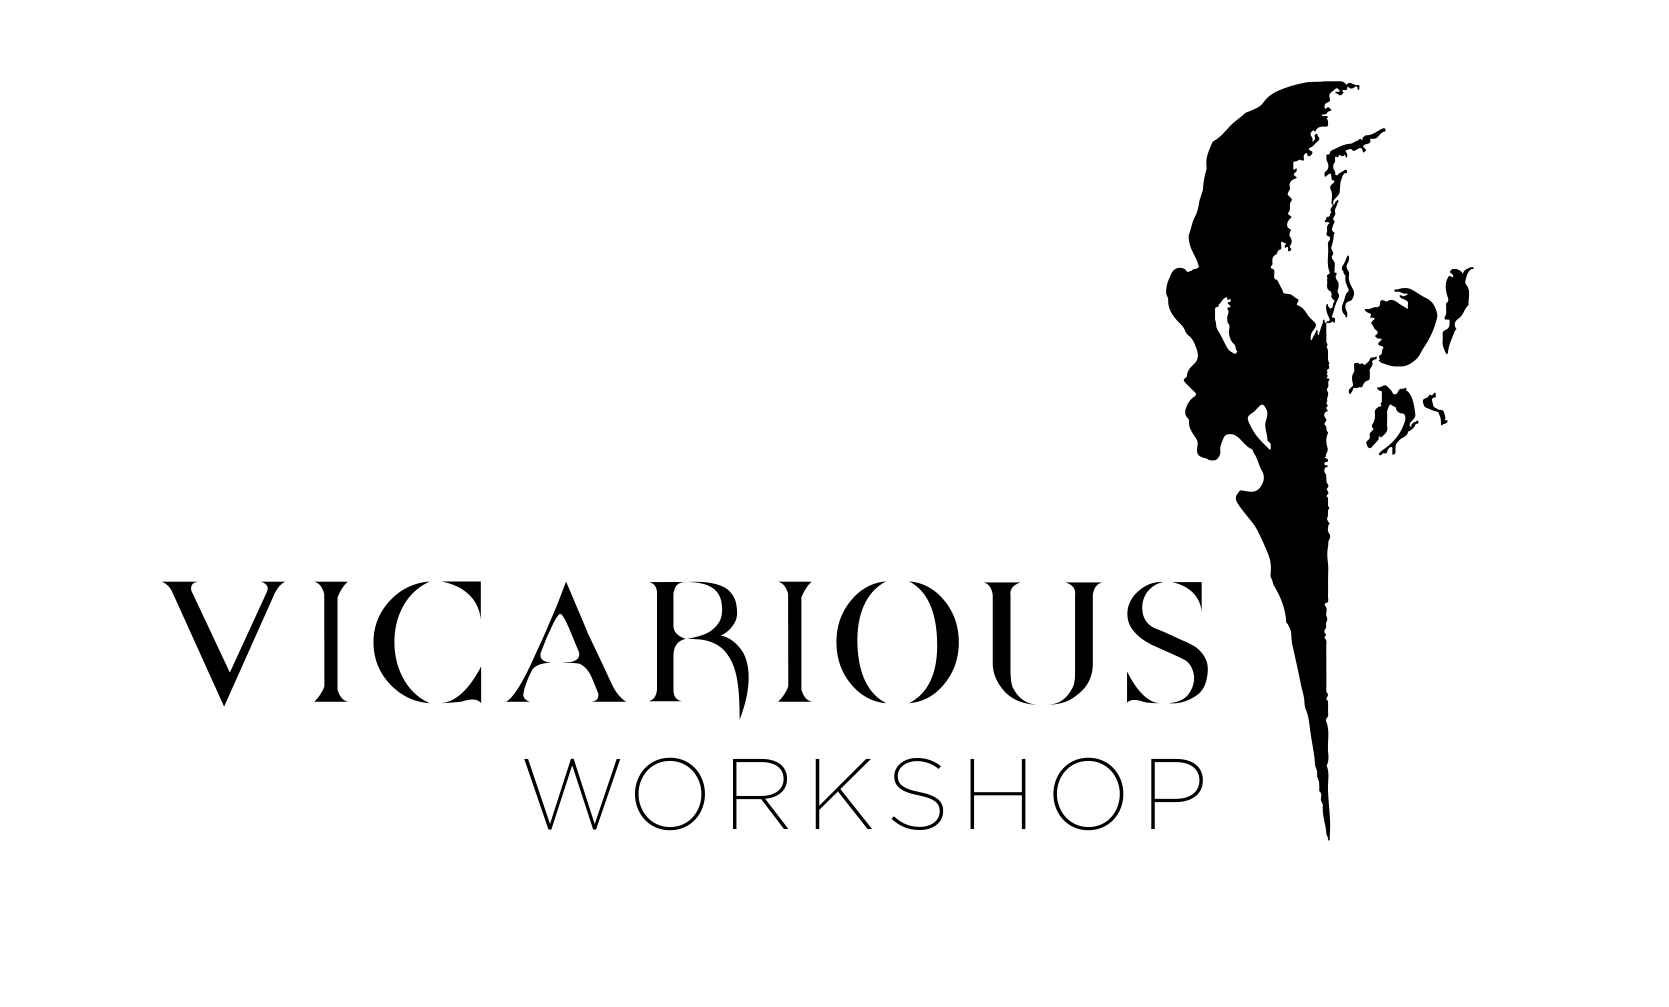 Vicarious Workshop